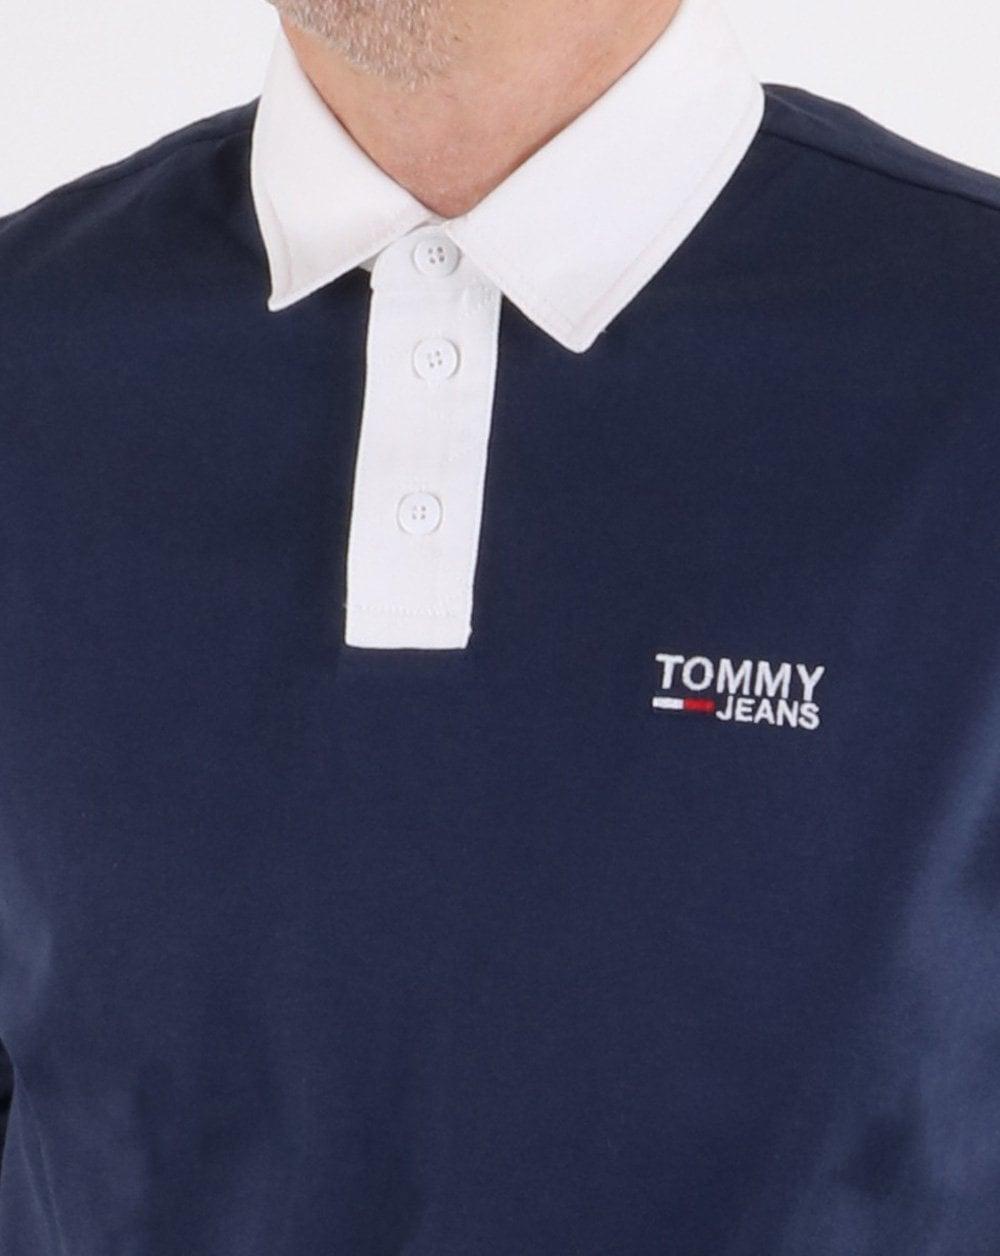 7ddd999f9 Tommy Hilfiger Essential Rugby Shirt Navy | 80s casual classics